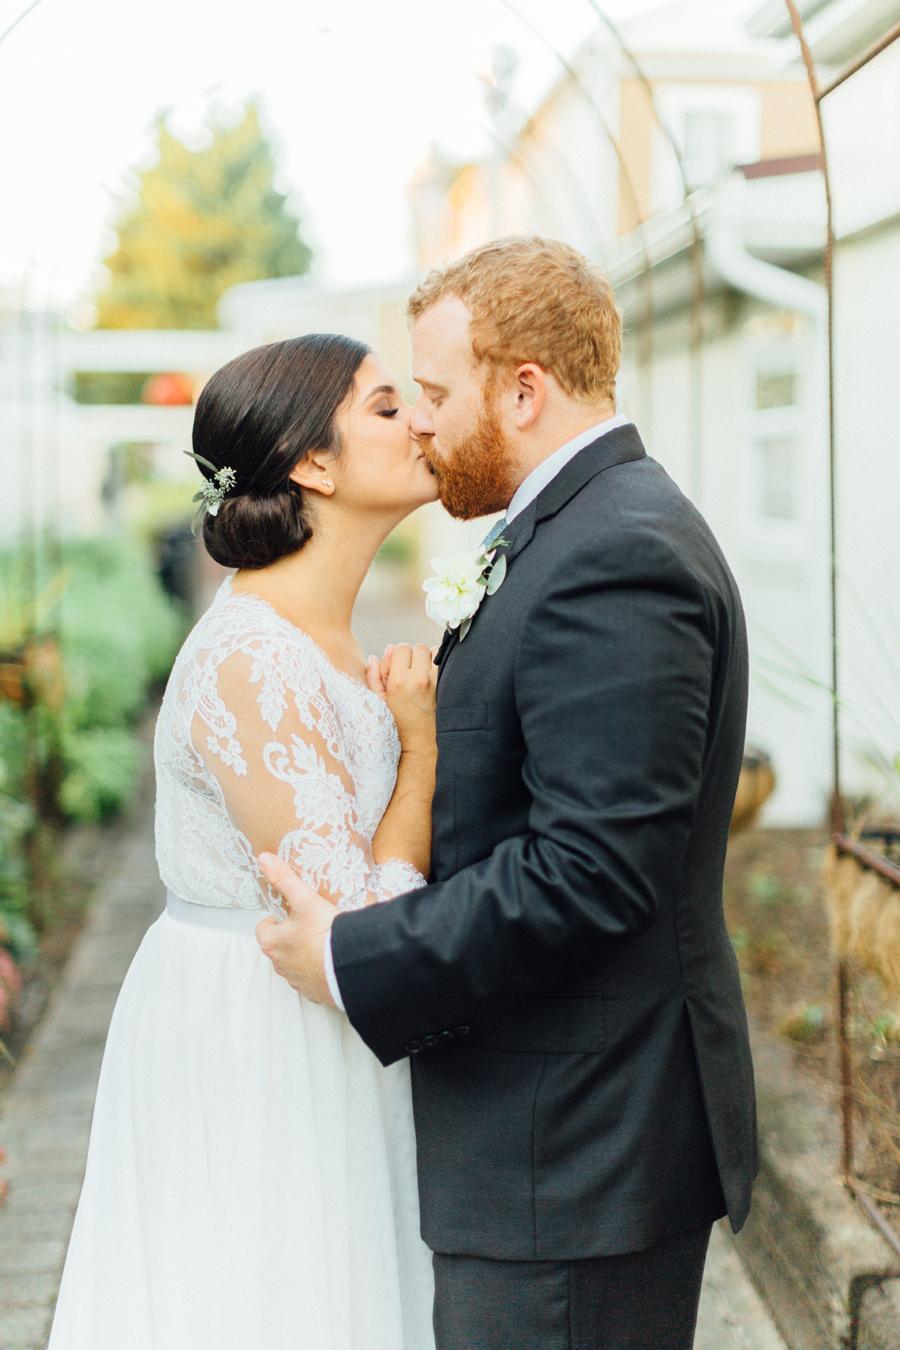 the-inn-at-leola-wedding-lancaster-pennsylvania-wedding-photographer-rebeka-viola-photograhy (94).jpg